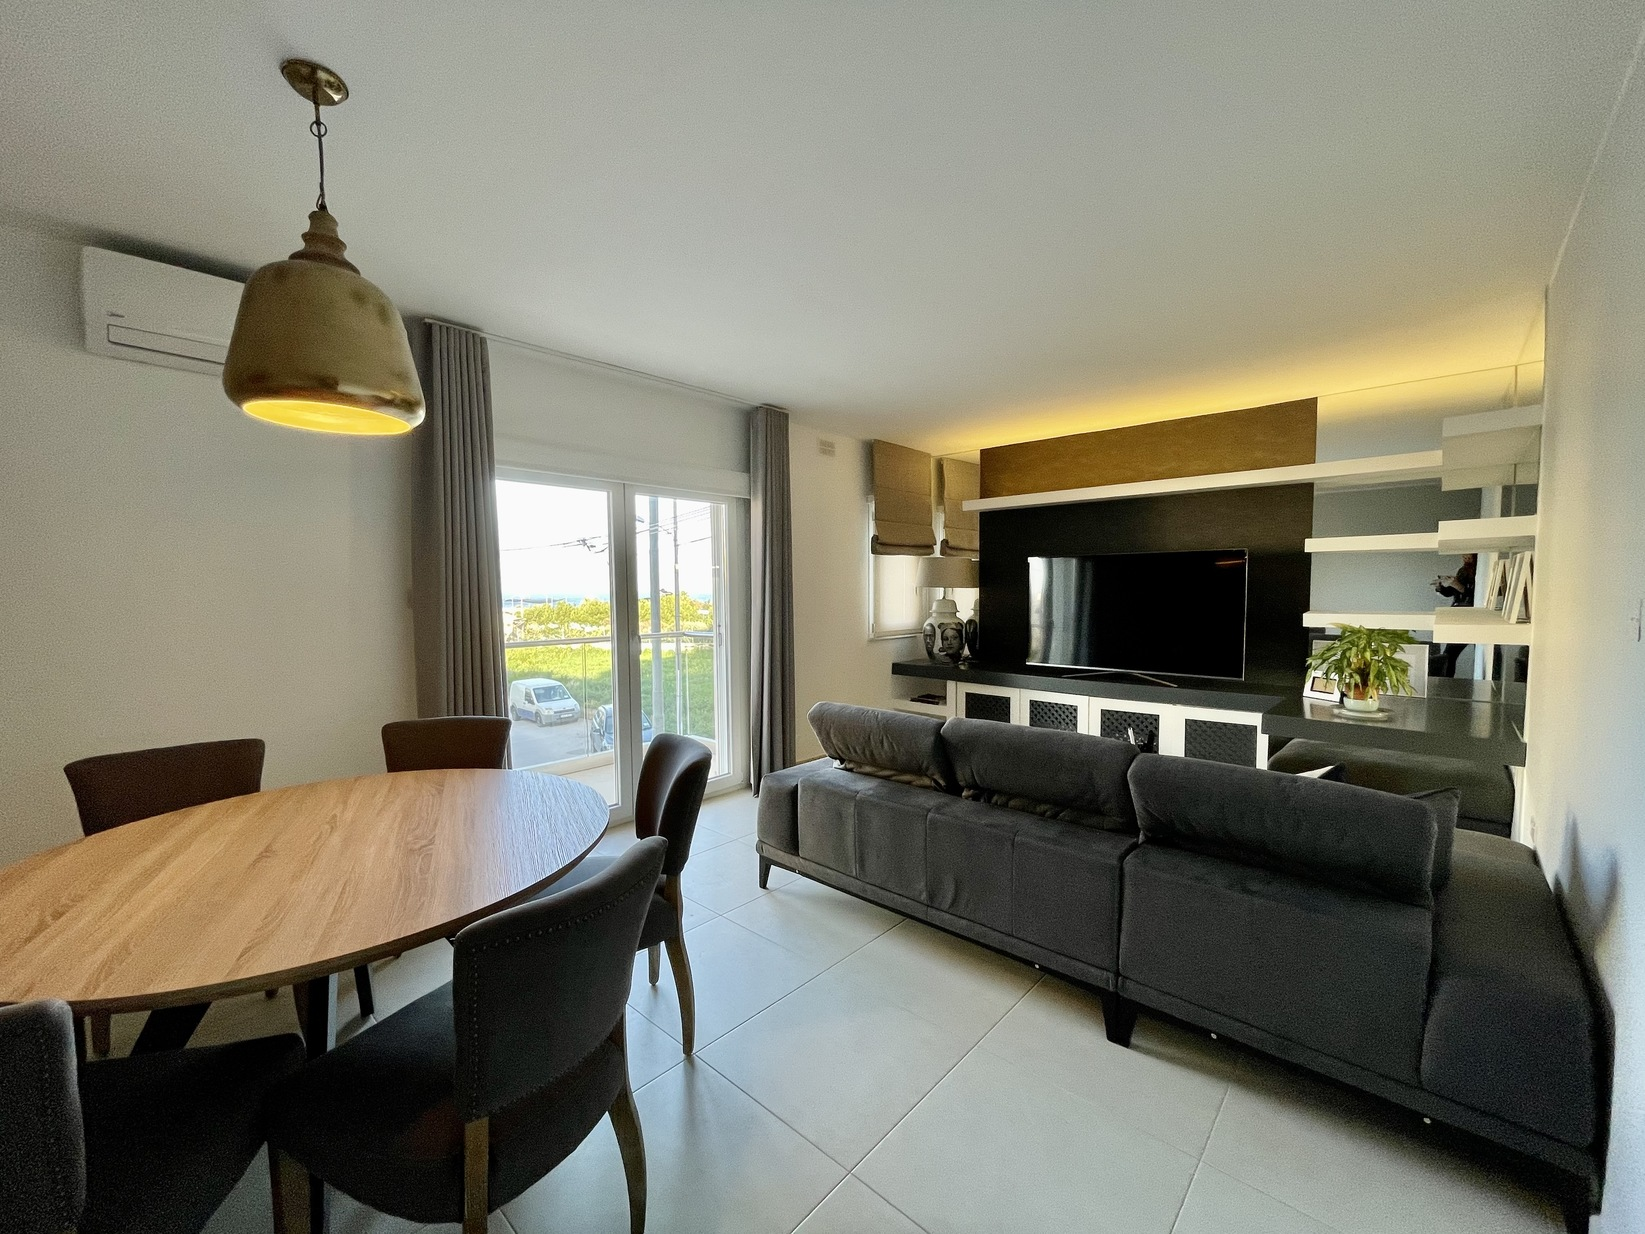 3 bed Apartment For Rent in Bahar Ic-Caghaq, Bahar ic-Caghaq - thumb 2